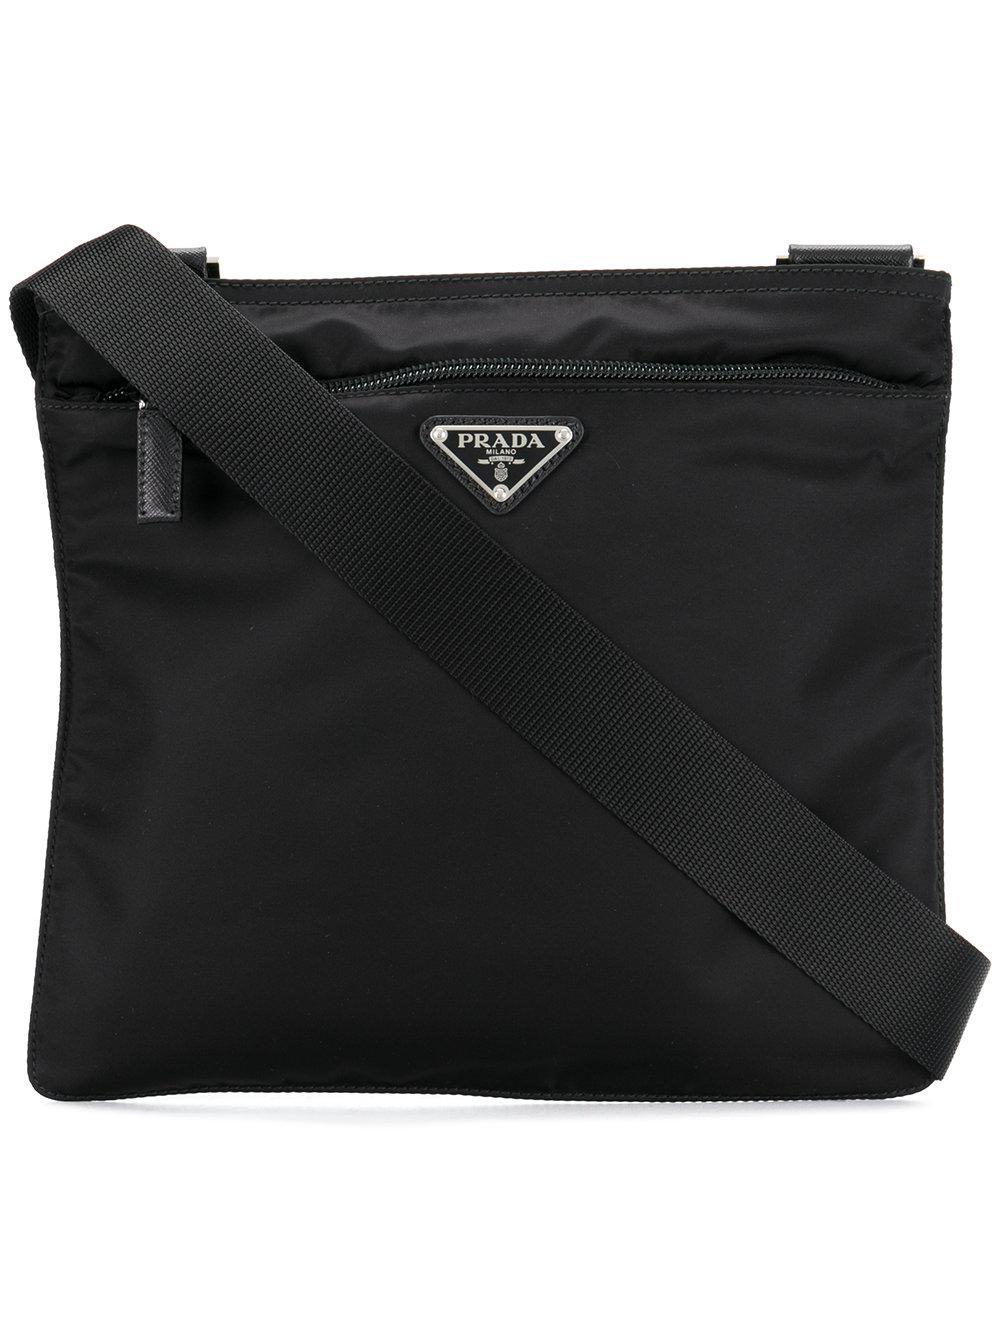 d20081c030793c Prada Logo Plaque Vela Cross-Body Bag - Farfetch In Black | ModeSens